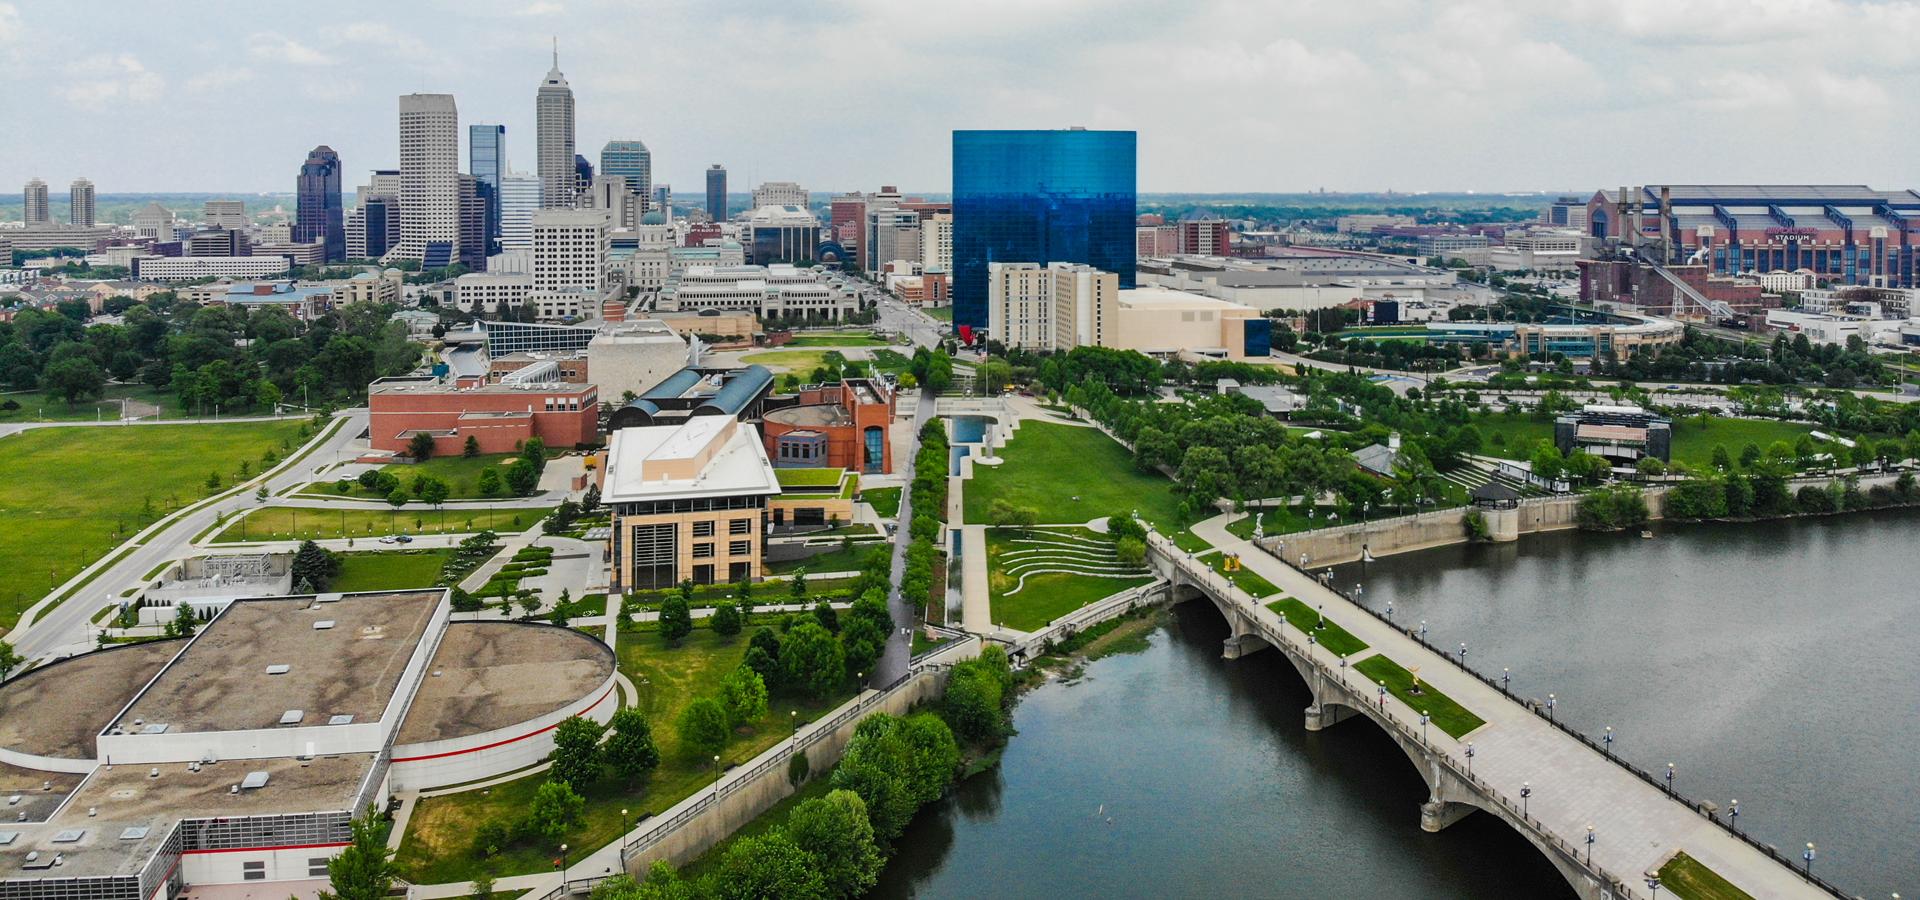 Peer-to-peer advisory in Indianapolis, Indiana, USA